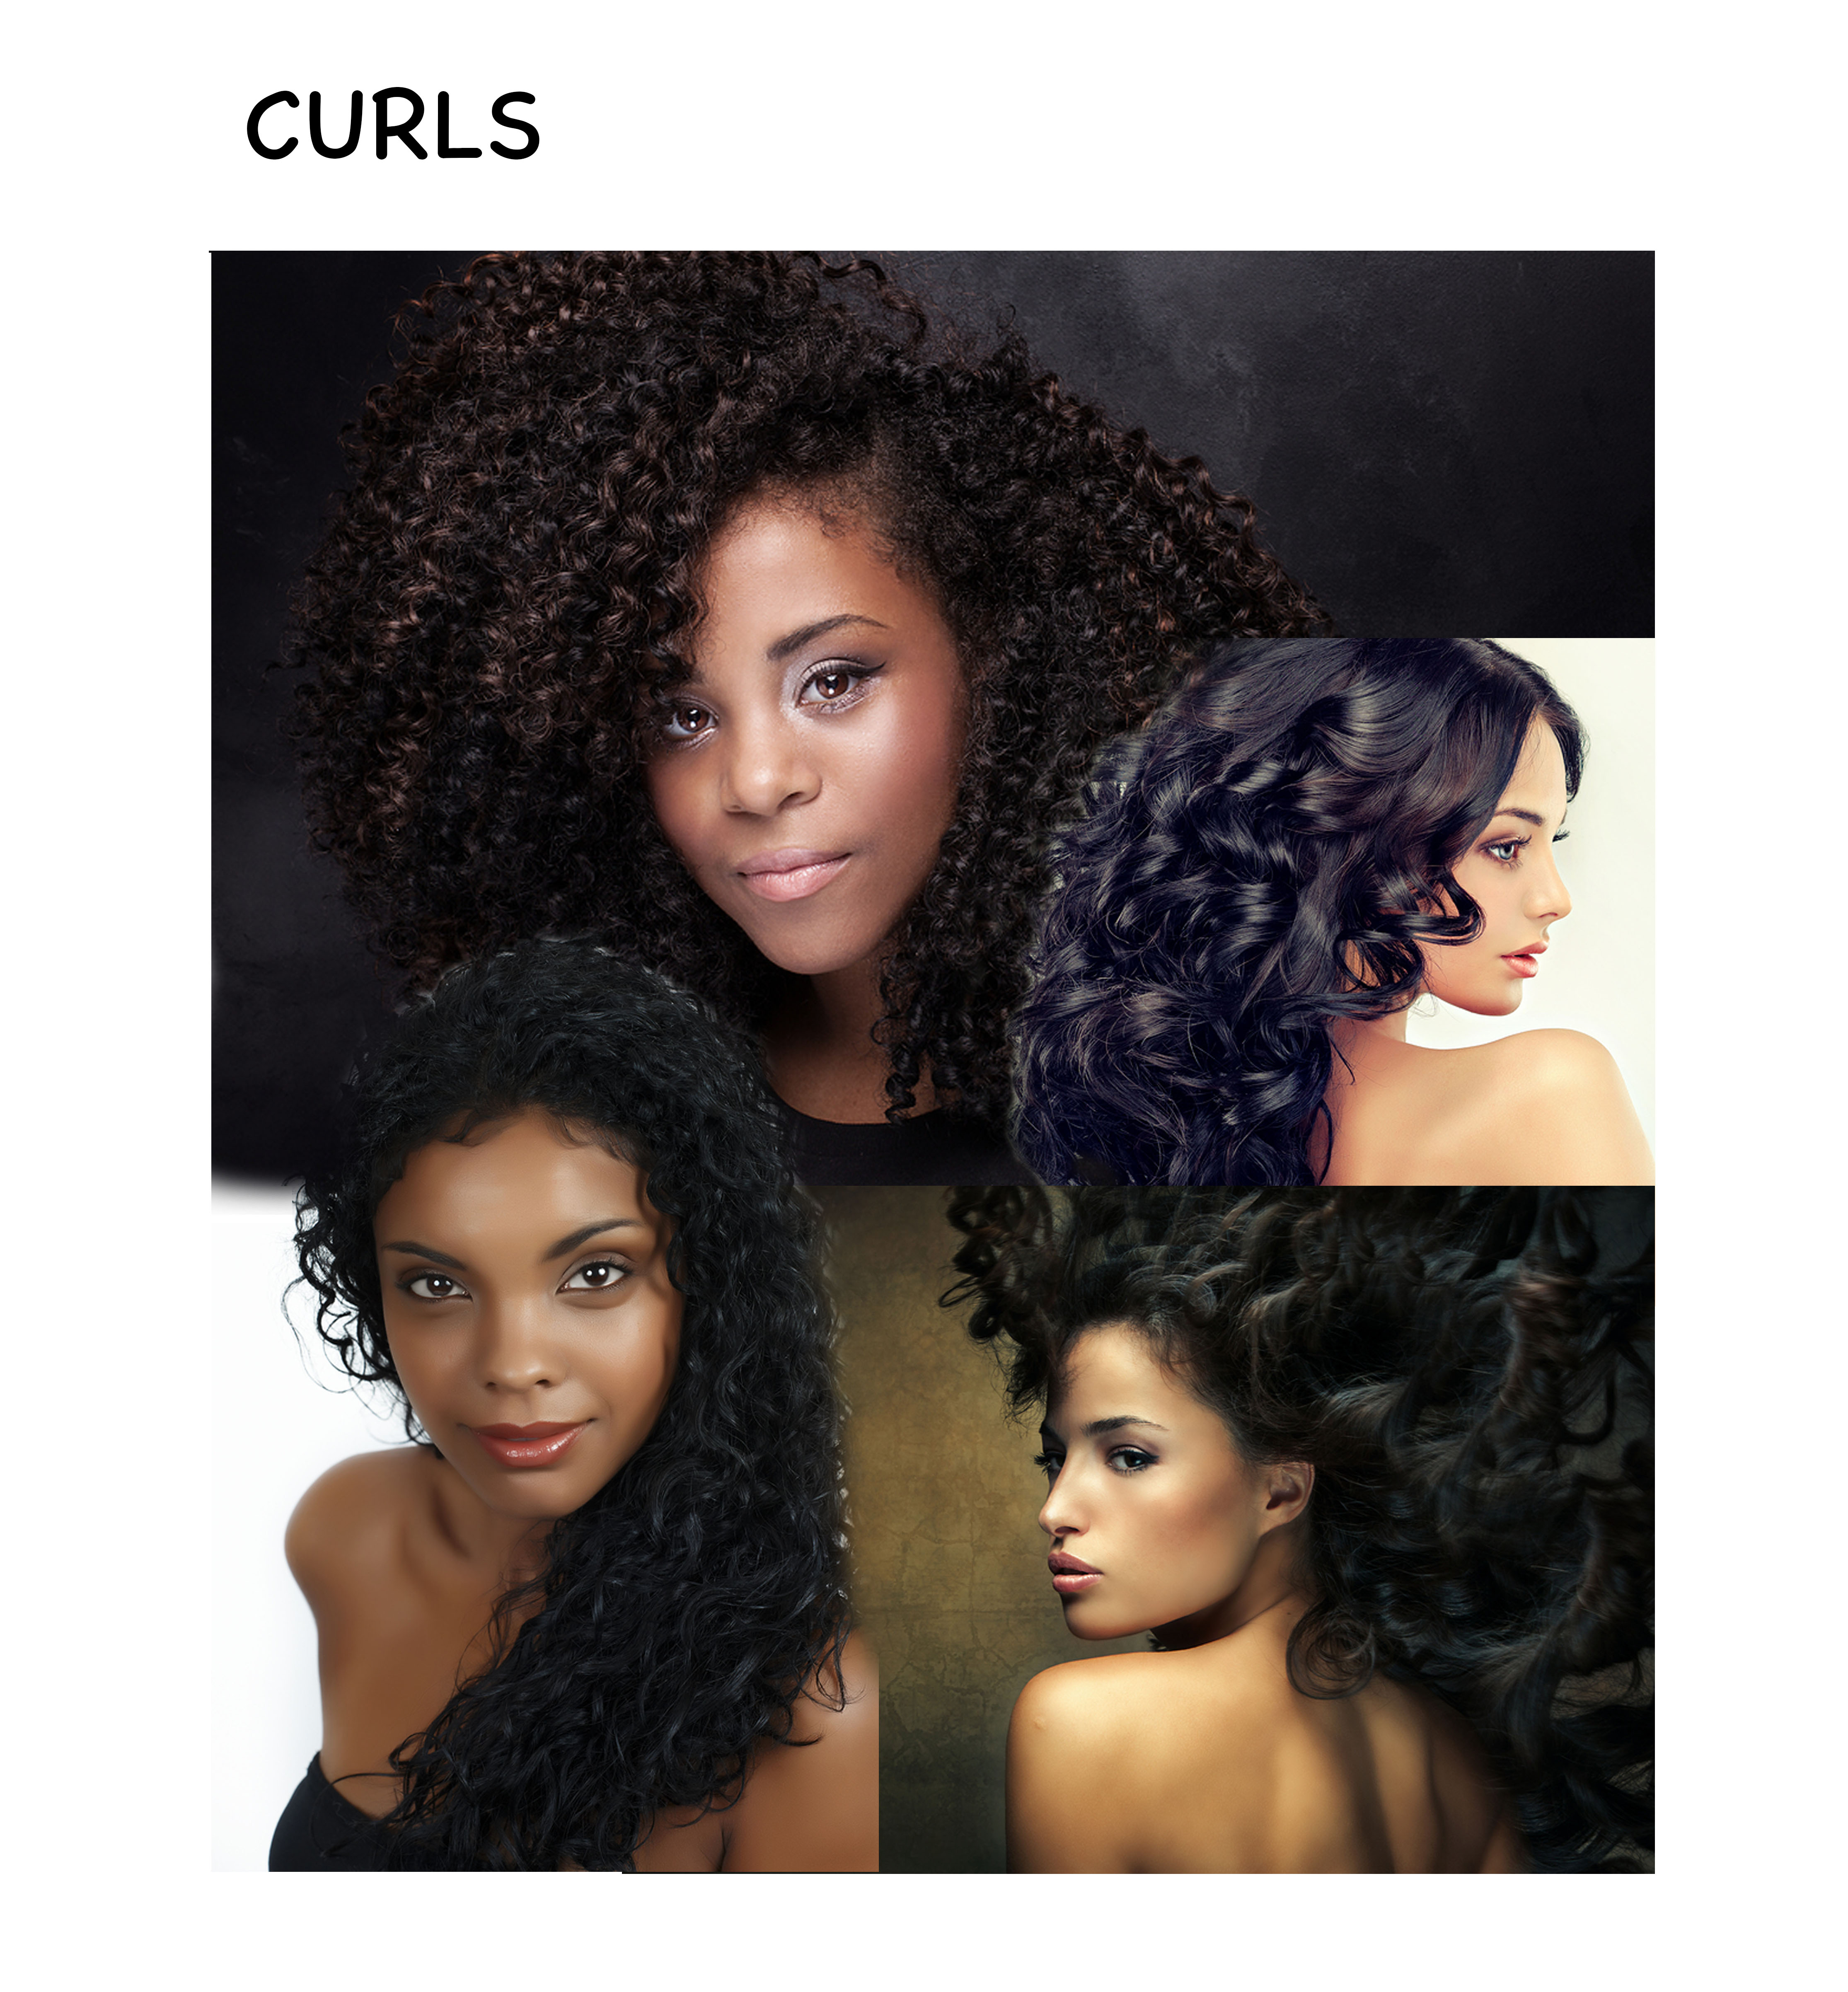 Curls-collage